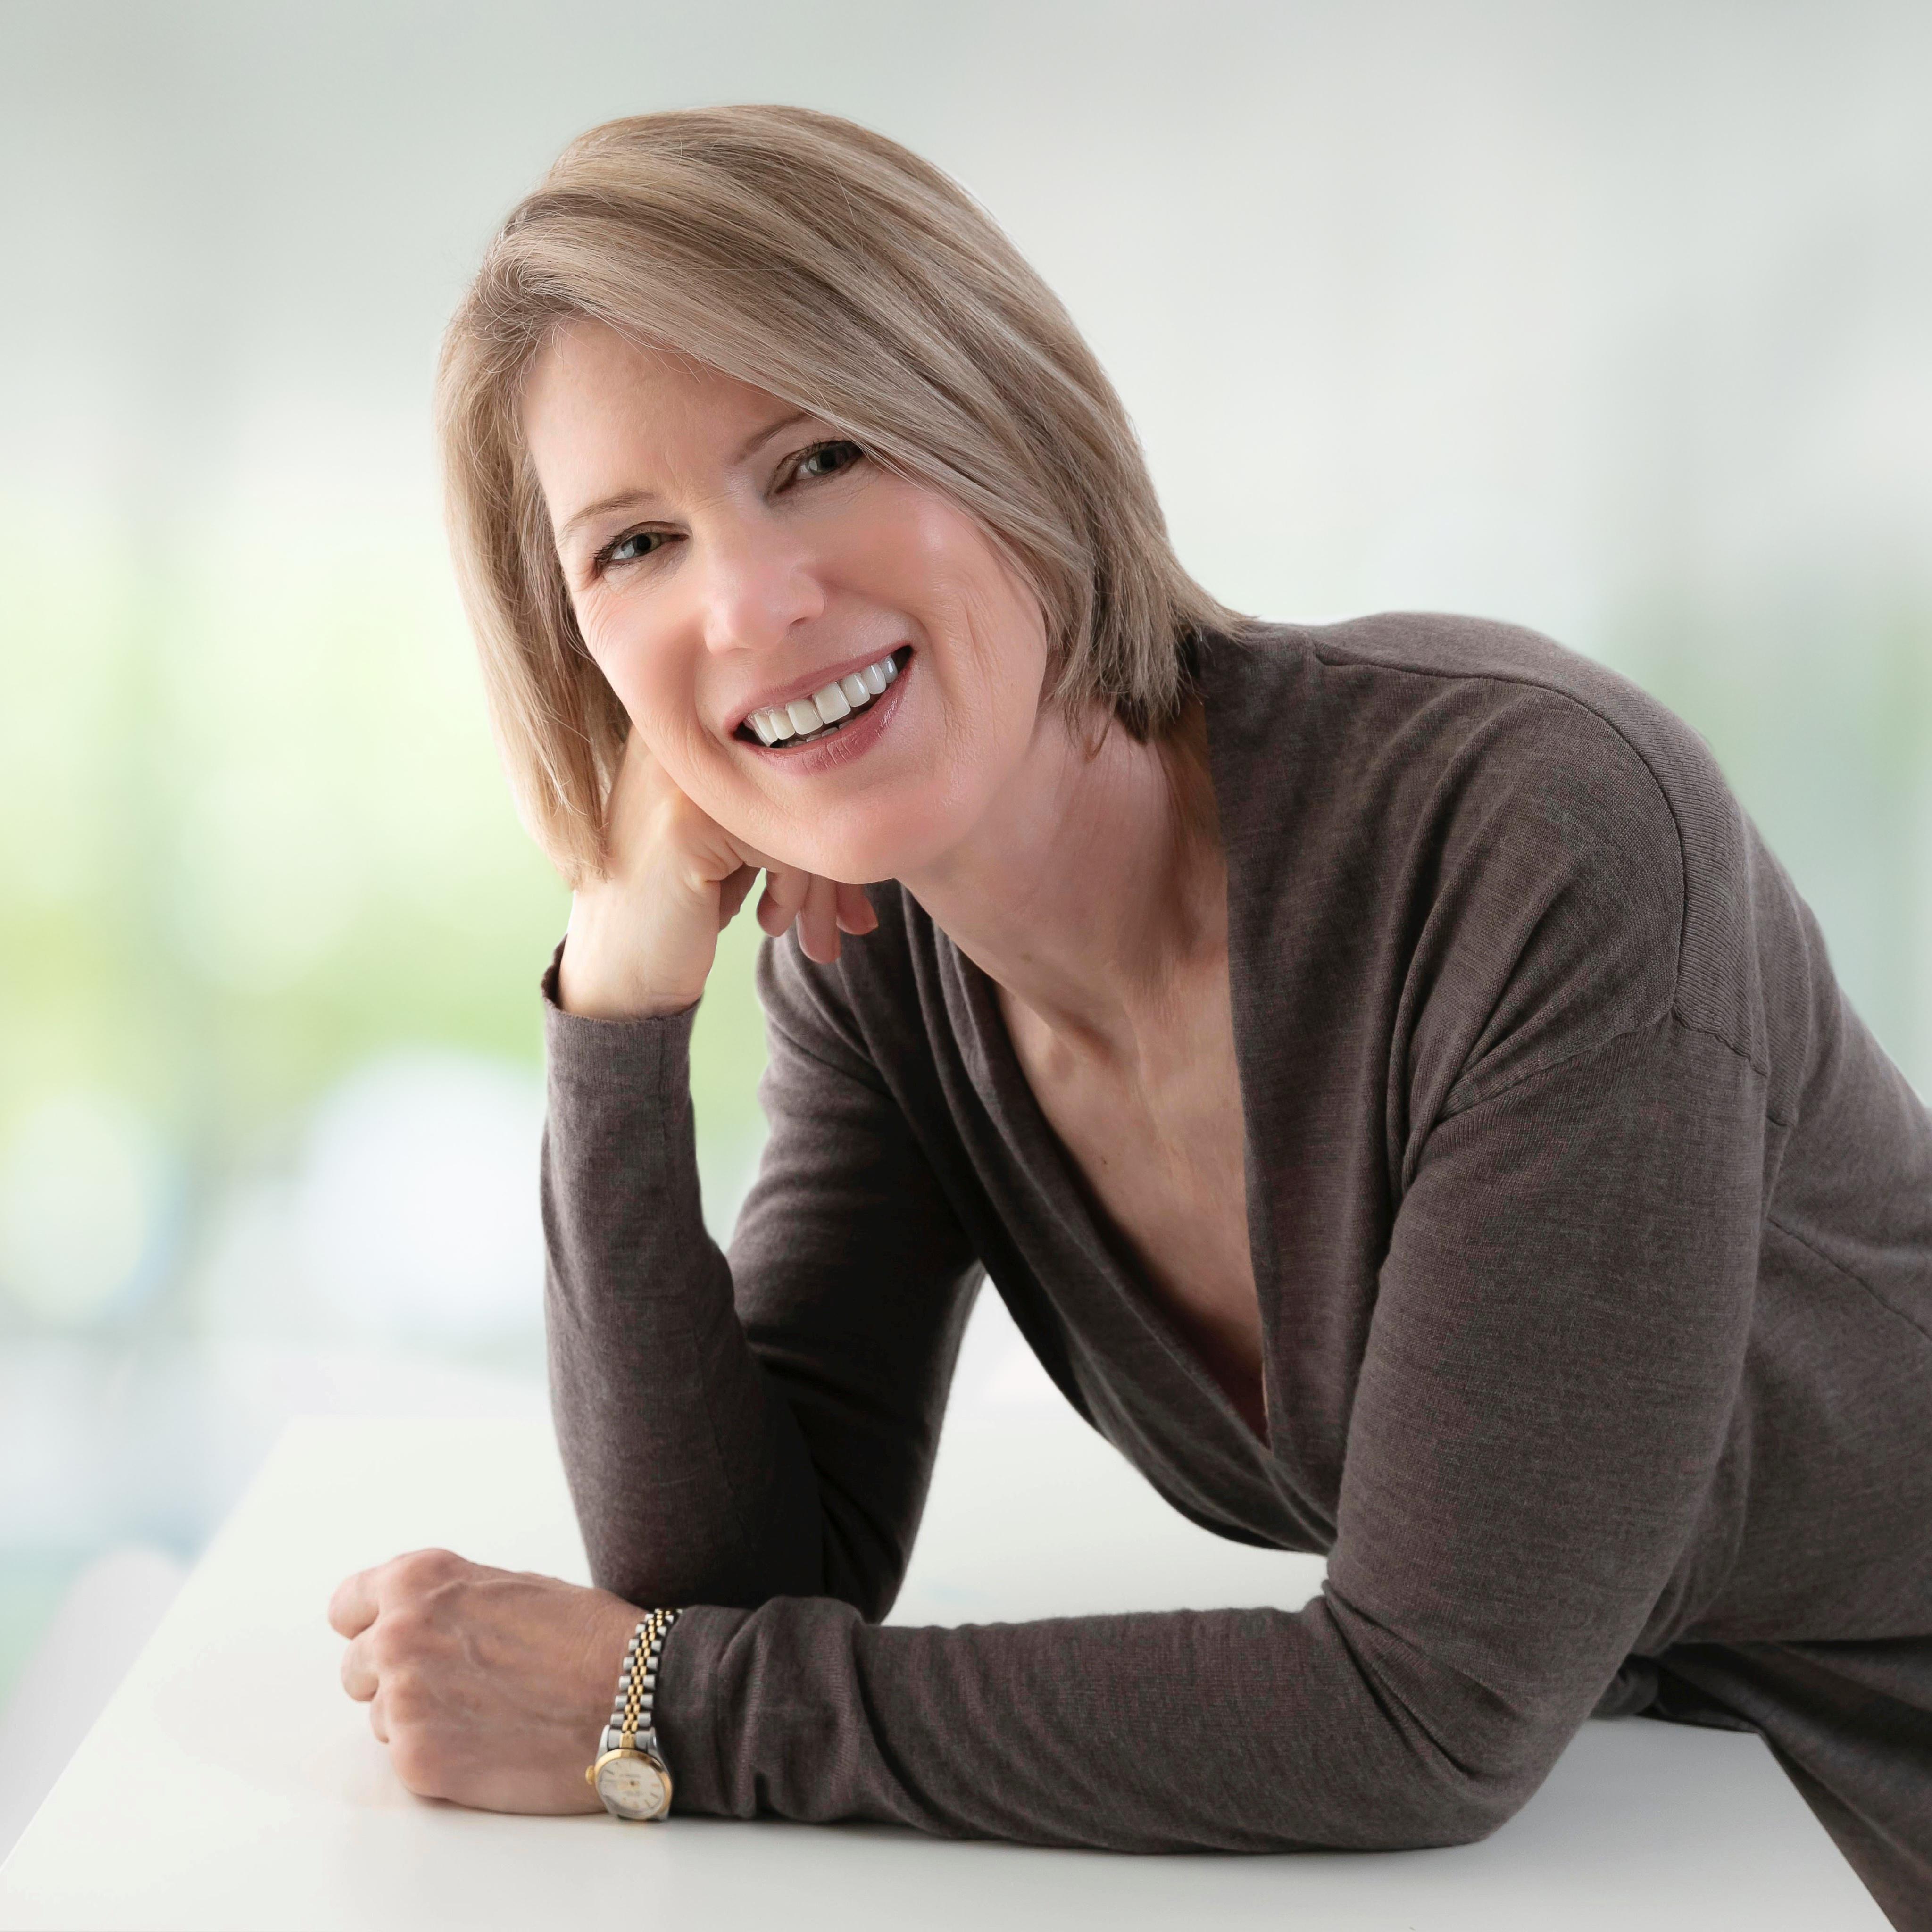 celebrate-picture-books-picture-book-review-Sandra-Nickel-headshot